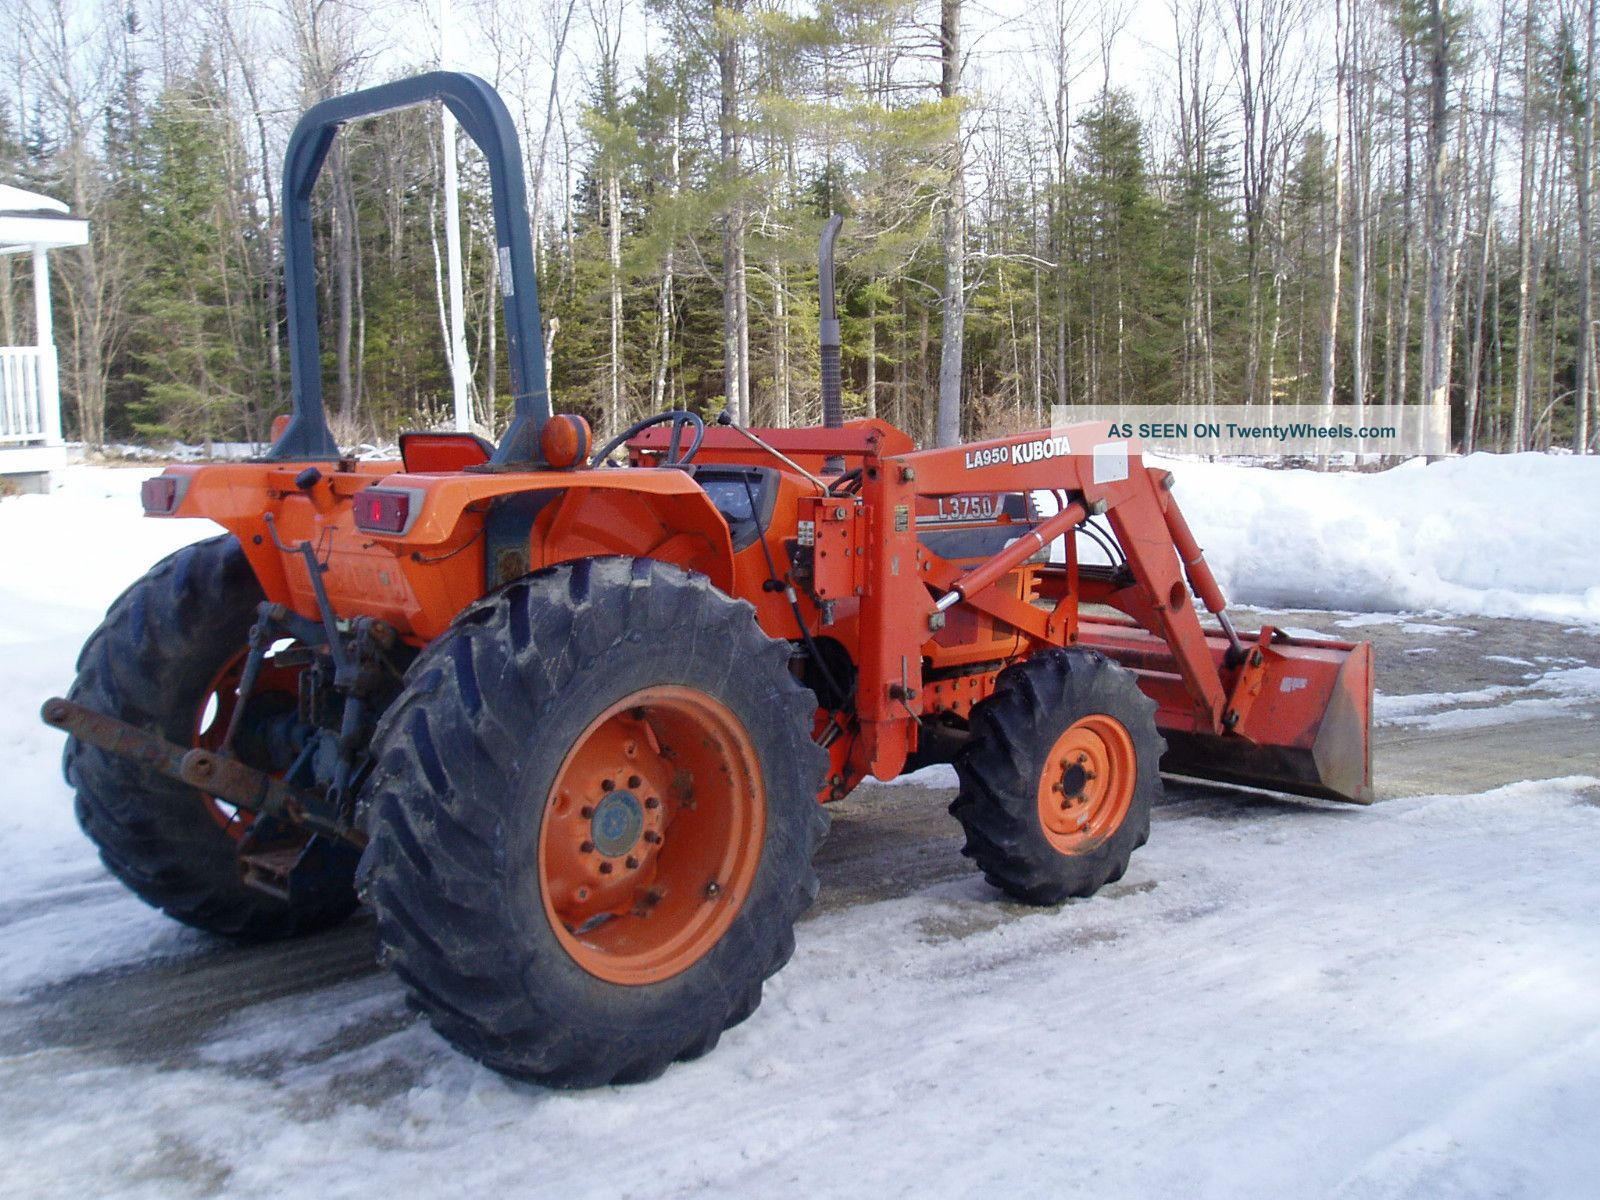 1991 Kubota L3750 45hp 5 Cylinder Diesel 4x4 W/loader Tractors photo 1